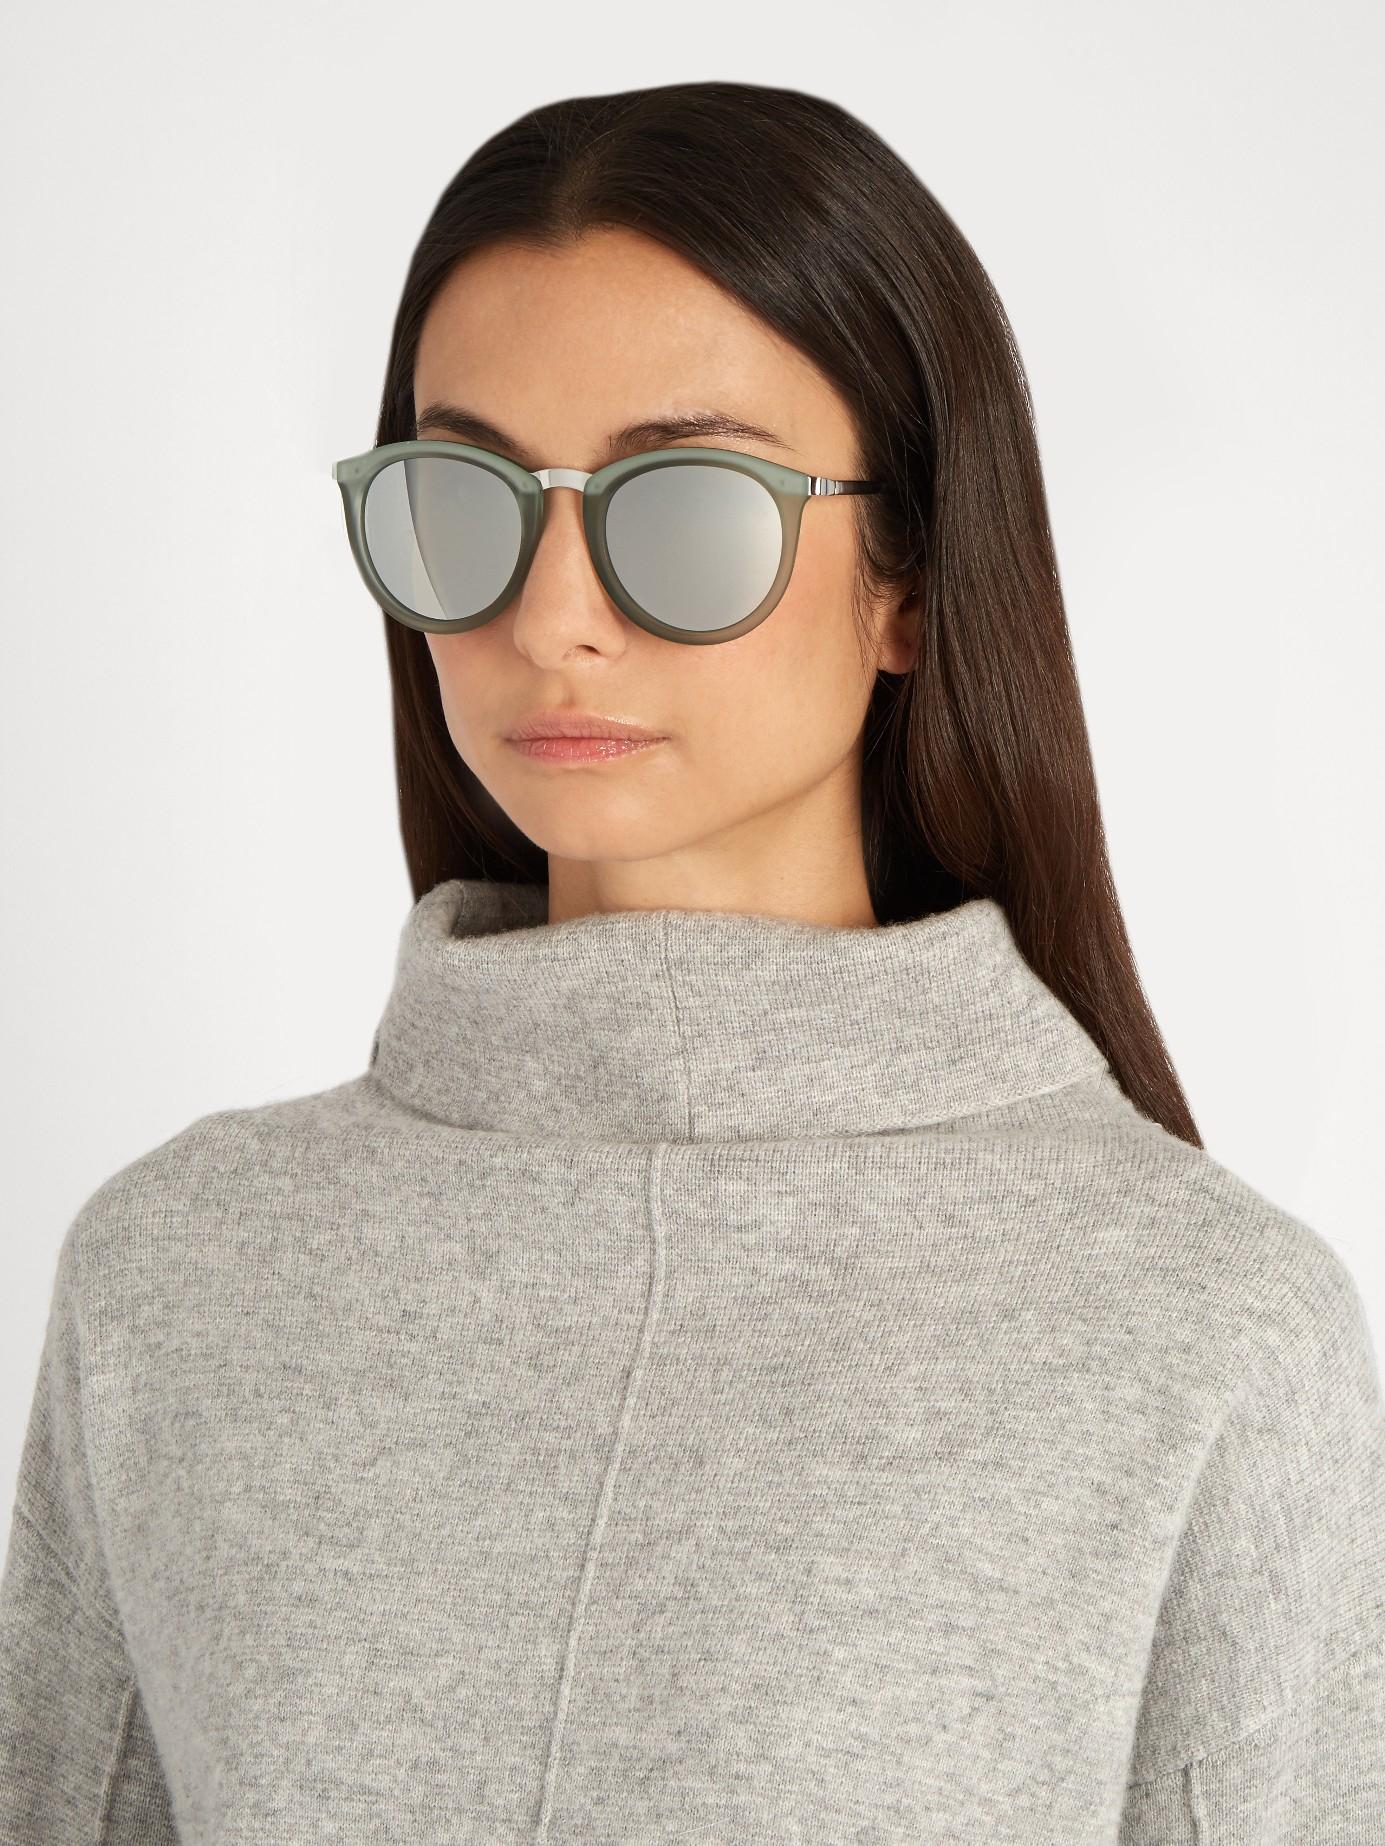 4fe3a77e963 Le Specs No Smirking Round-frame Sunglasses in Green - Lyst